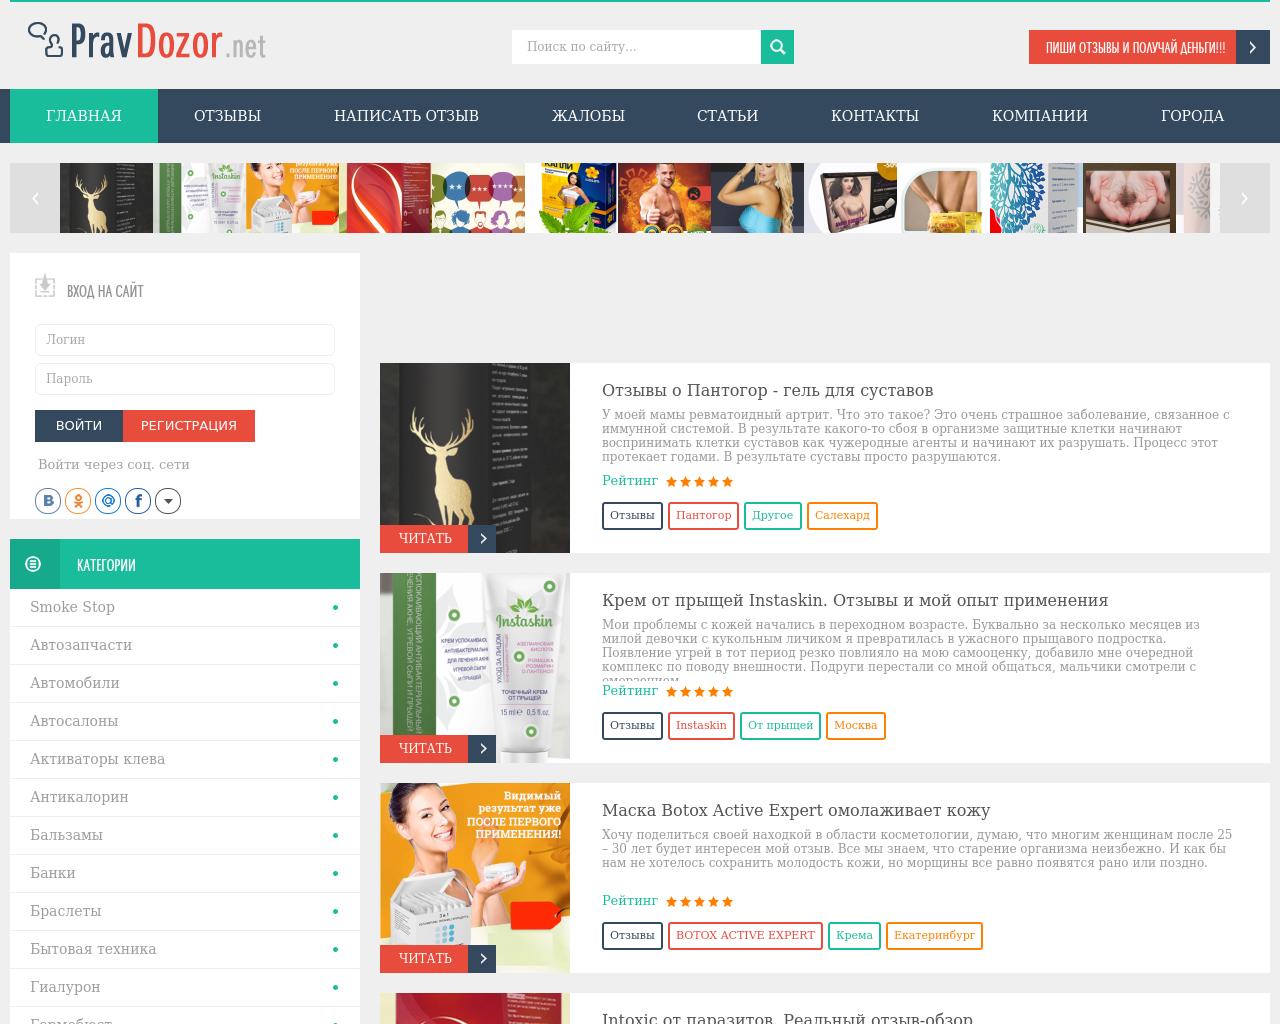 PravDozor.net-Advertising-Reviews-Pricing